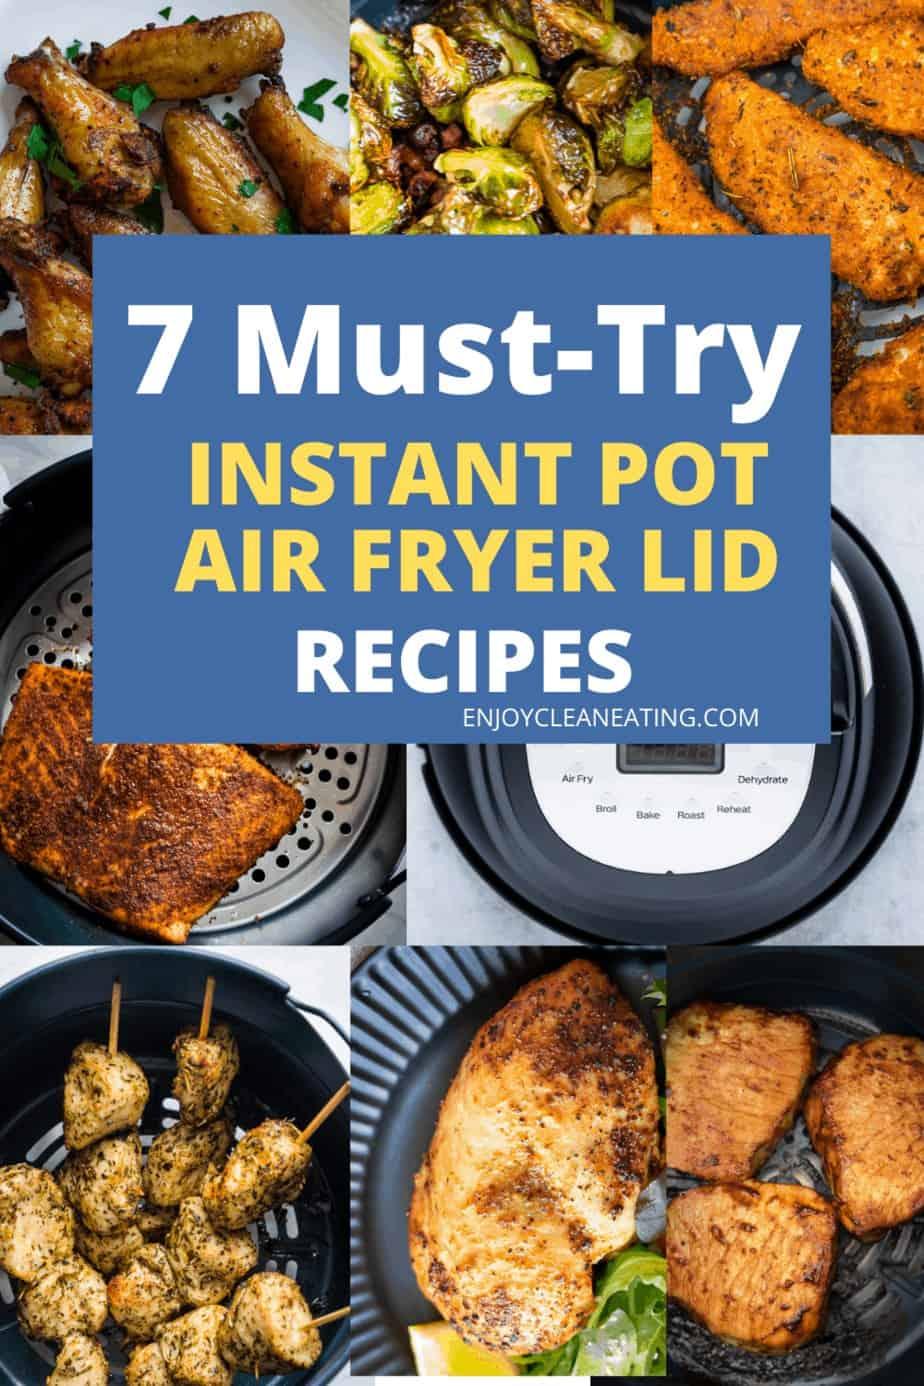 7 must try instant pot air fryer lid